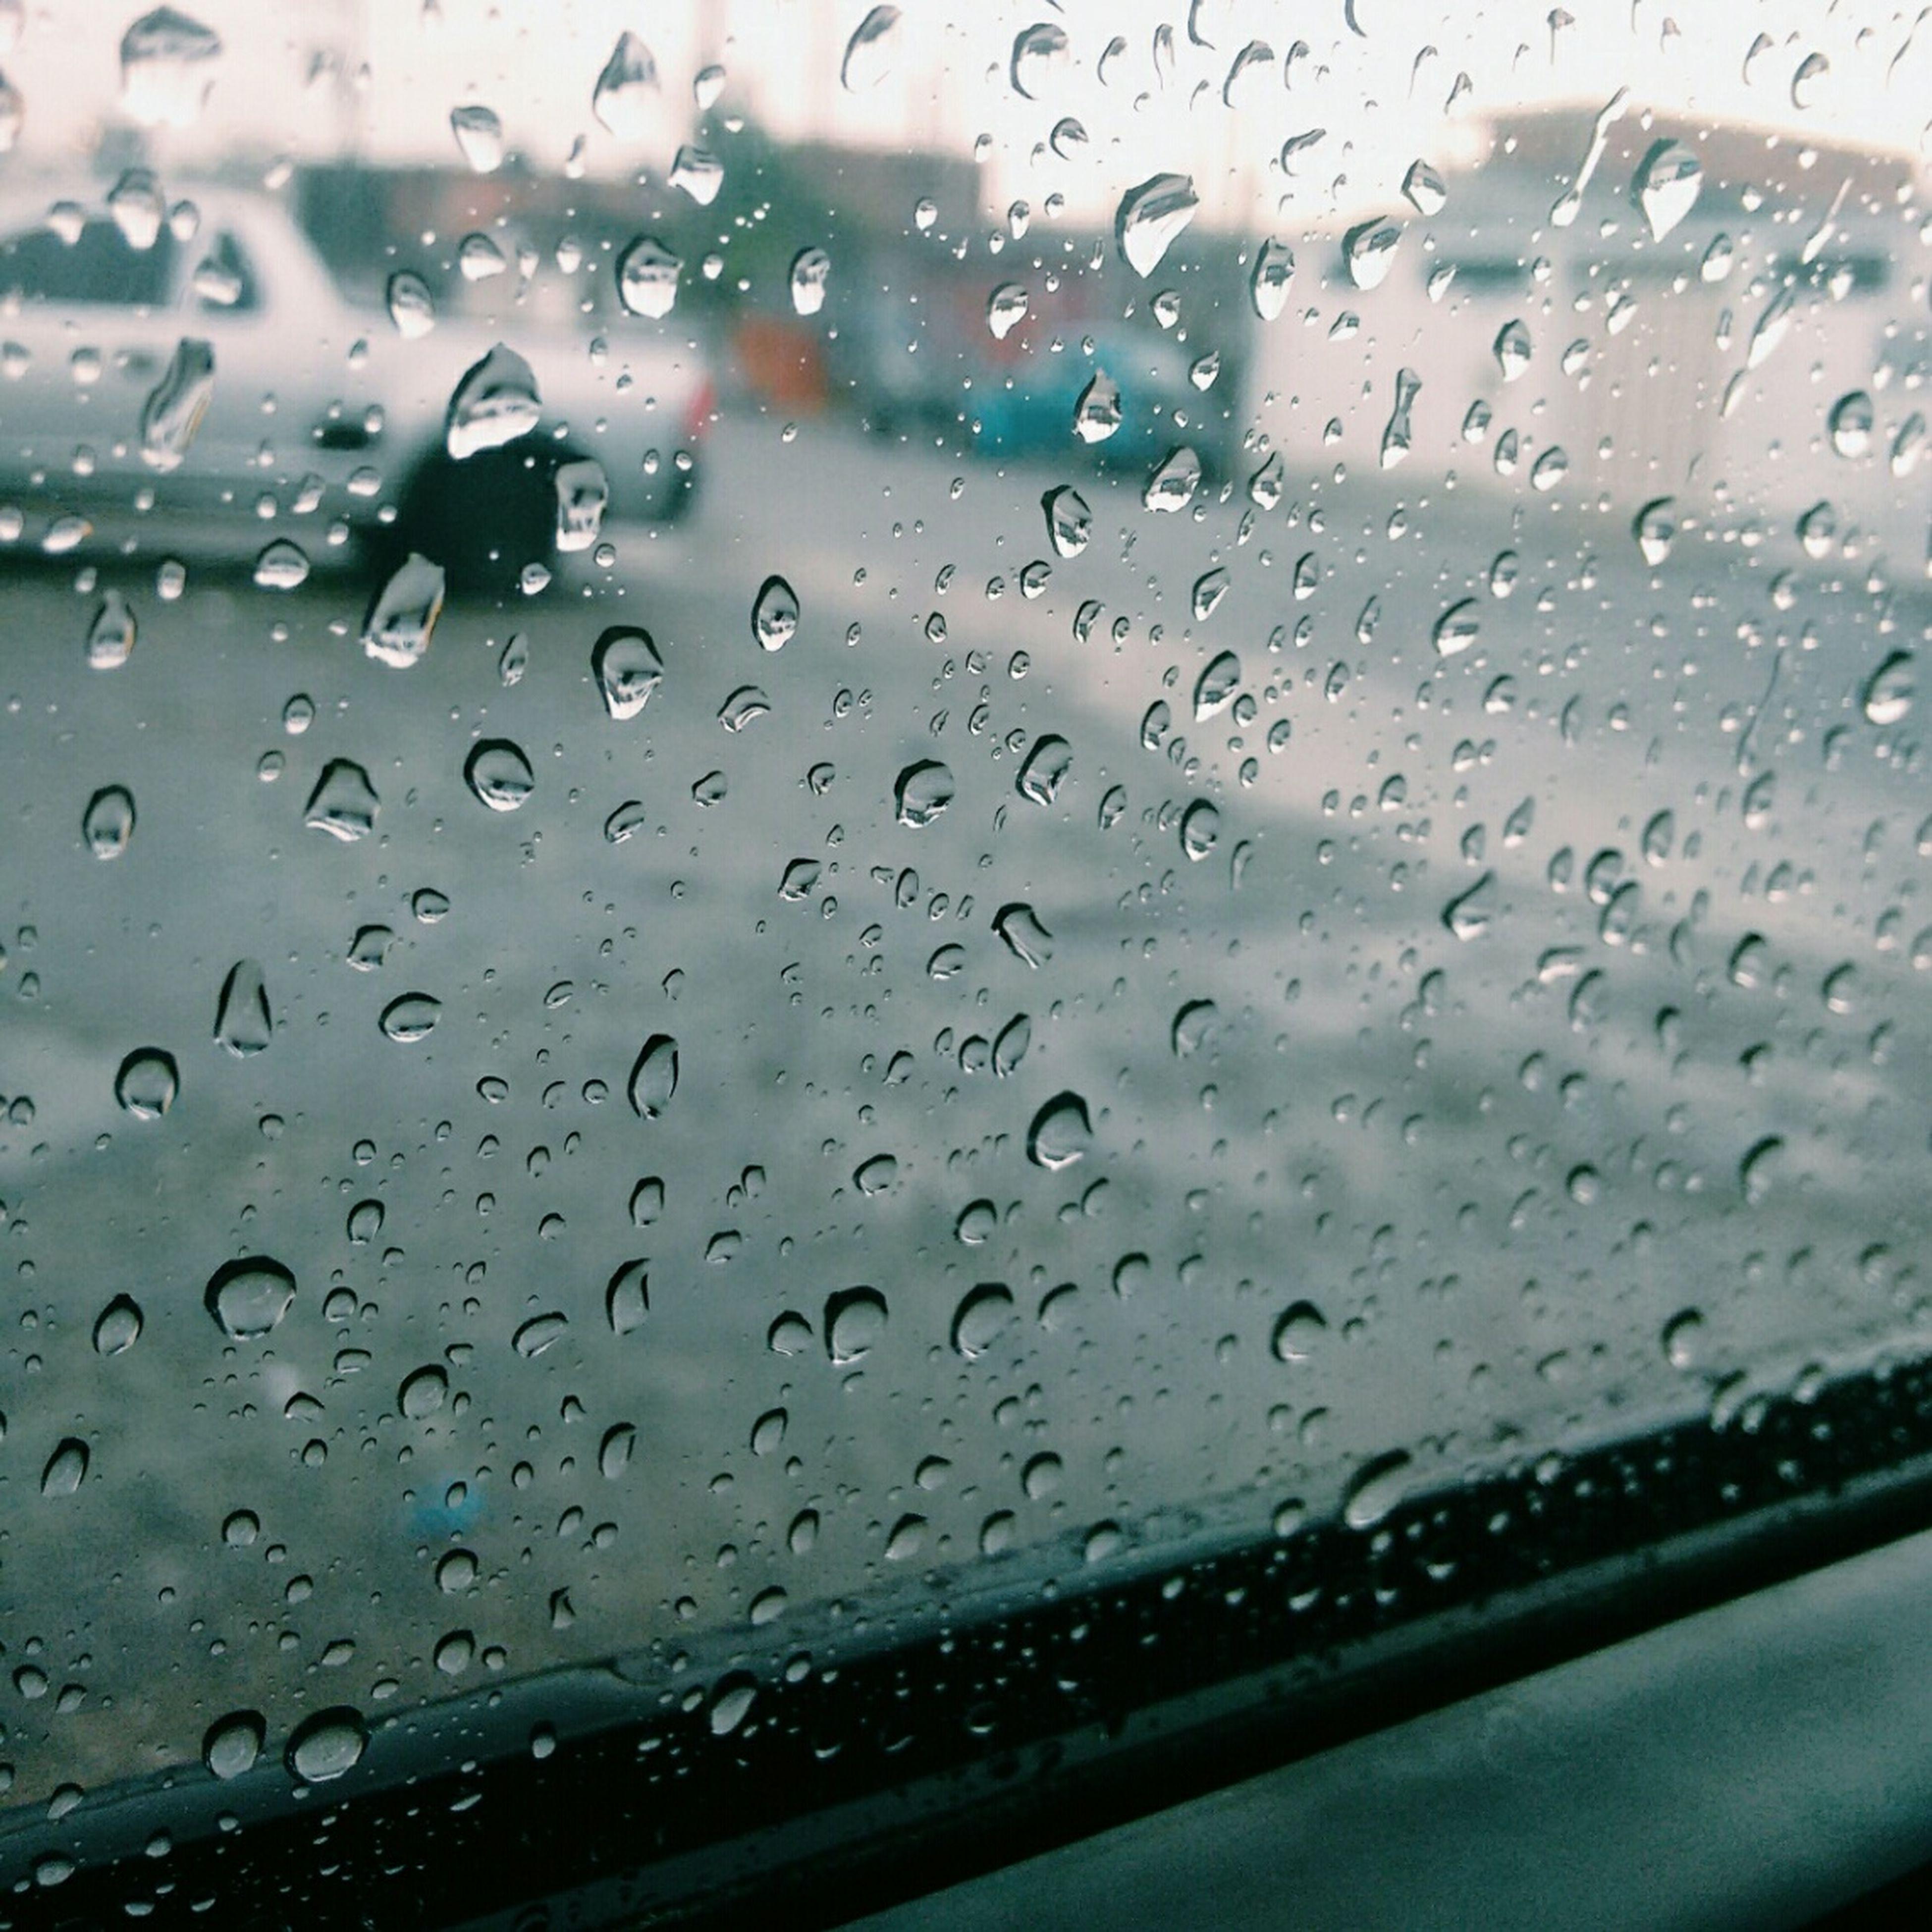 drop, window, wet, transparent, glass - material, transportation, rain, indoors, water, vehicle interior, mode of transport, car, weather, raindrop, season, car interior, windshield, land vehicle, glass, close-up